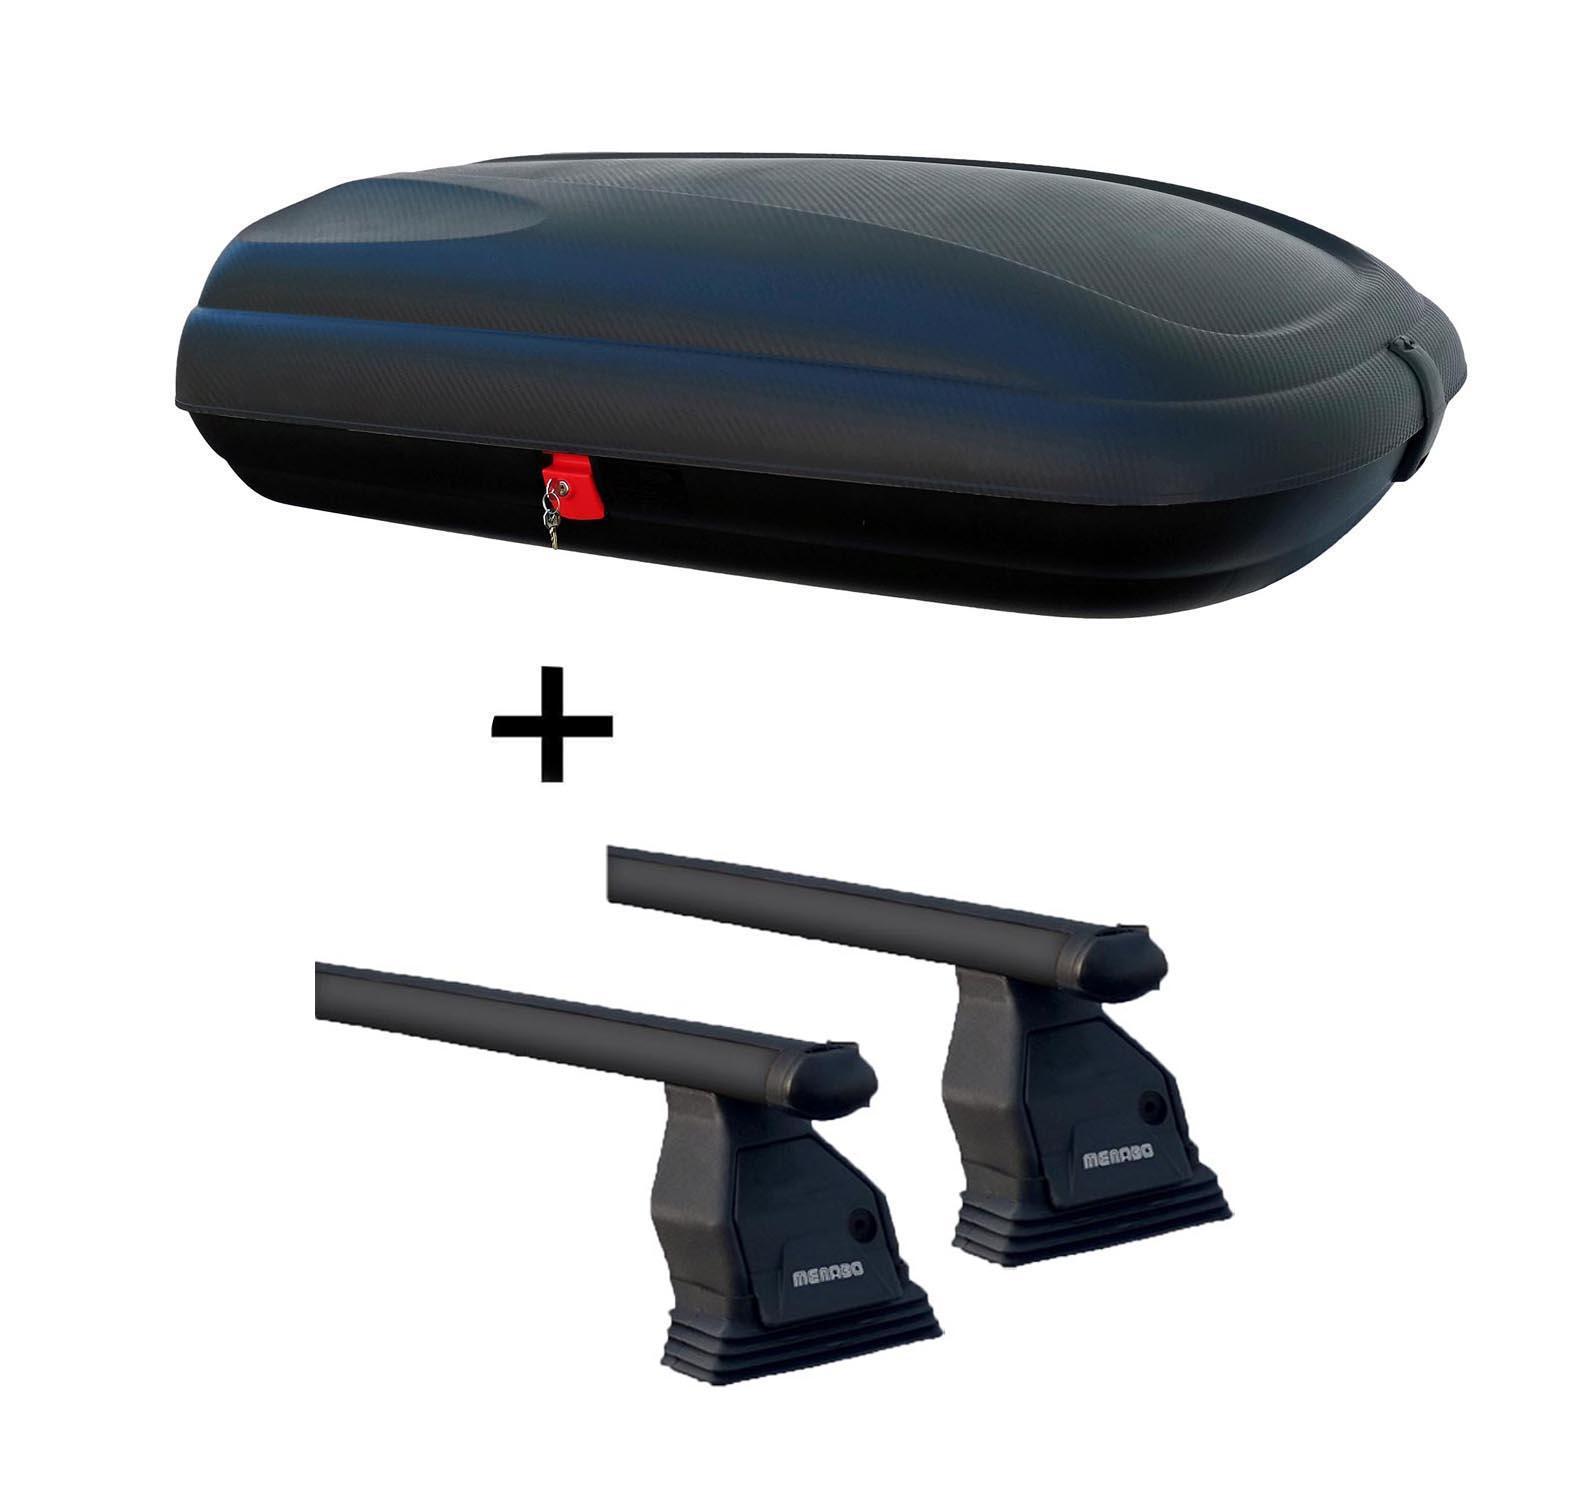 dachbox vdpba320l carbonlook dachtr ger tema f r ford focus c max 03 10 stahl ebay. Black Bedroom Furniture Sets. Home Design Ideas